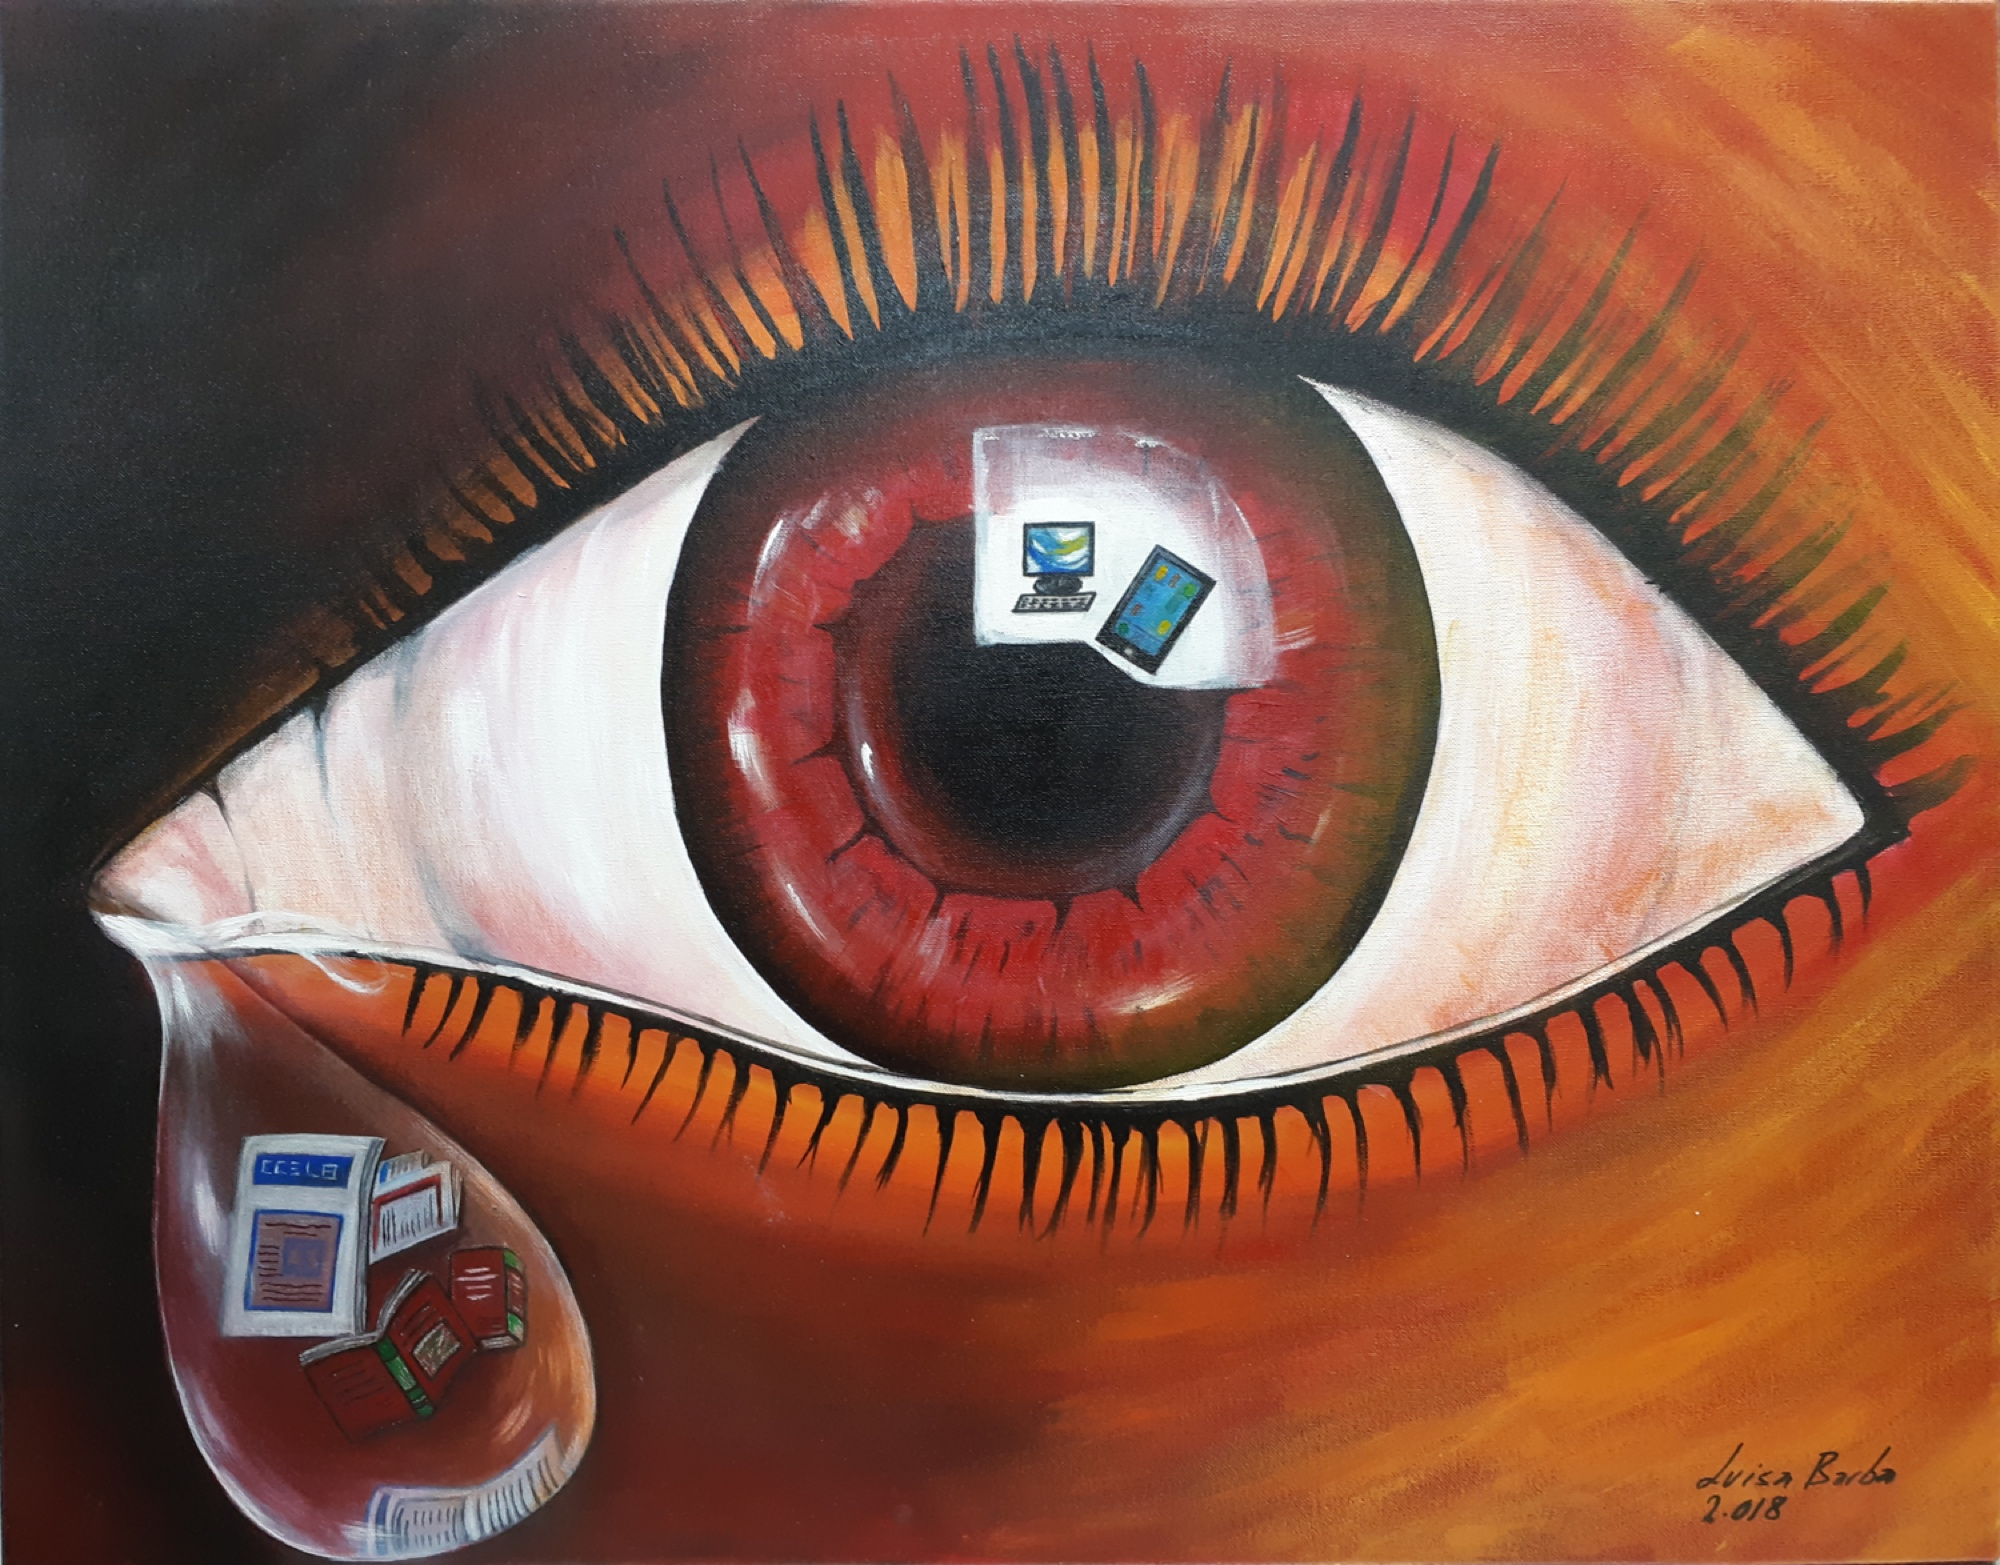 """ El ojo rojo"" 2.018 Acrilyc on canvas. Size without frame: 85 x 65cm"